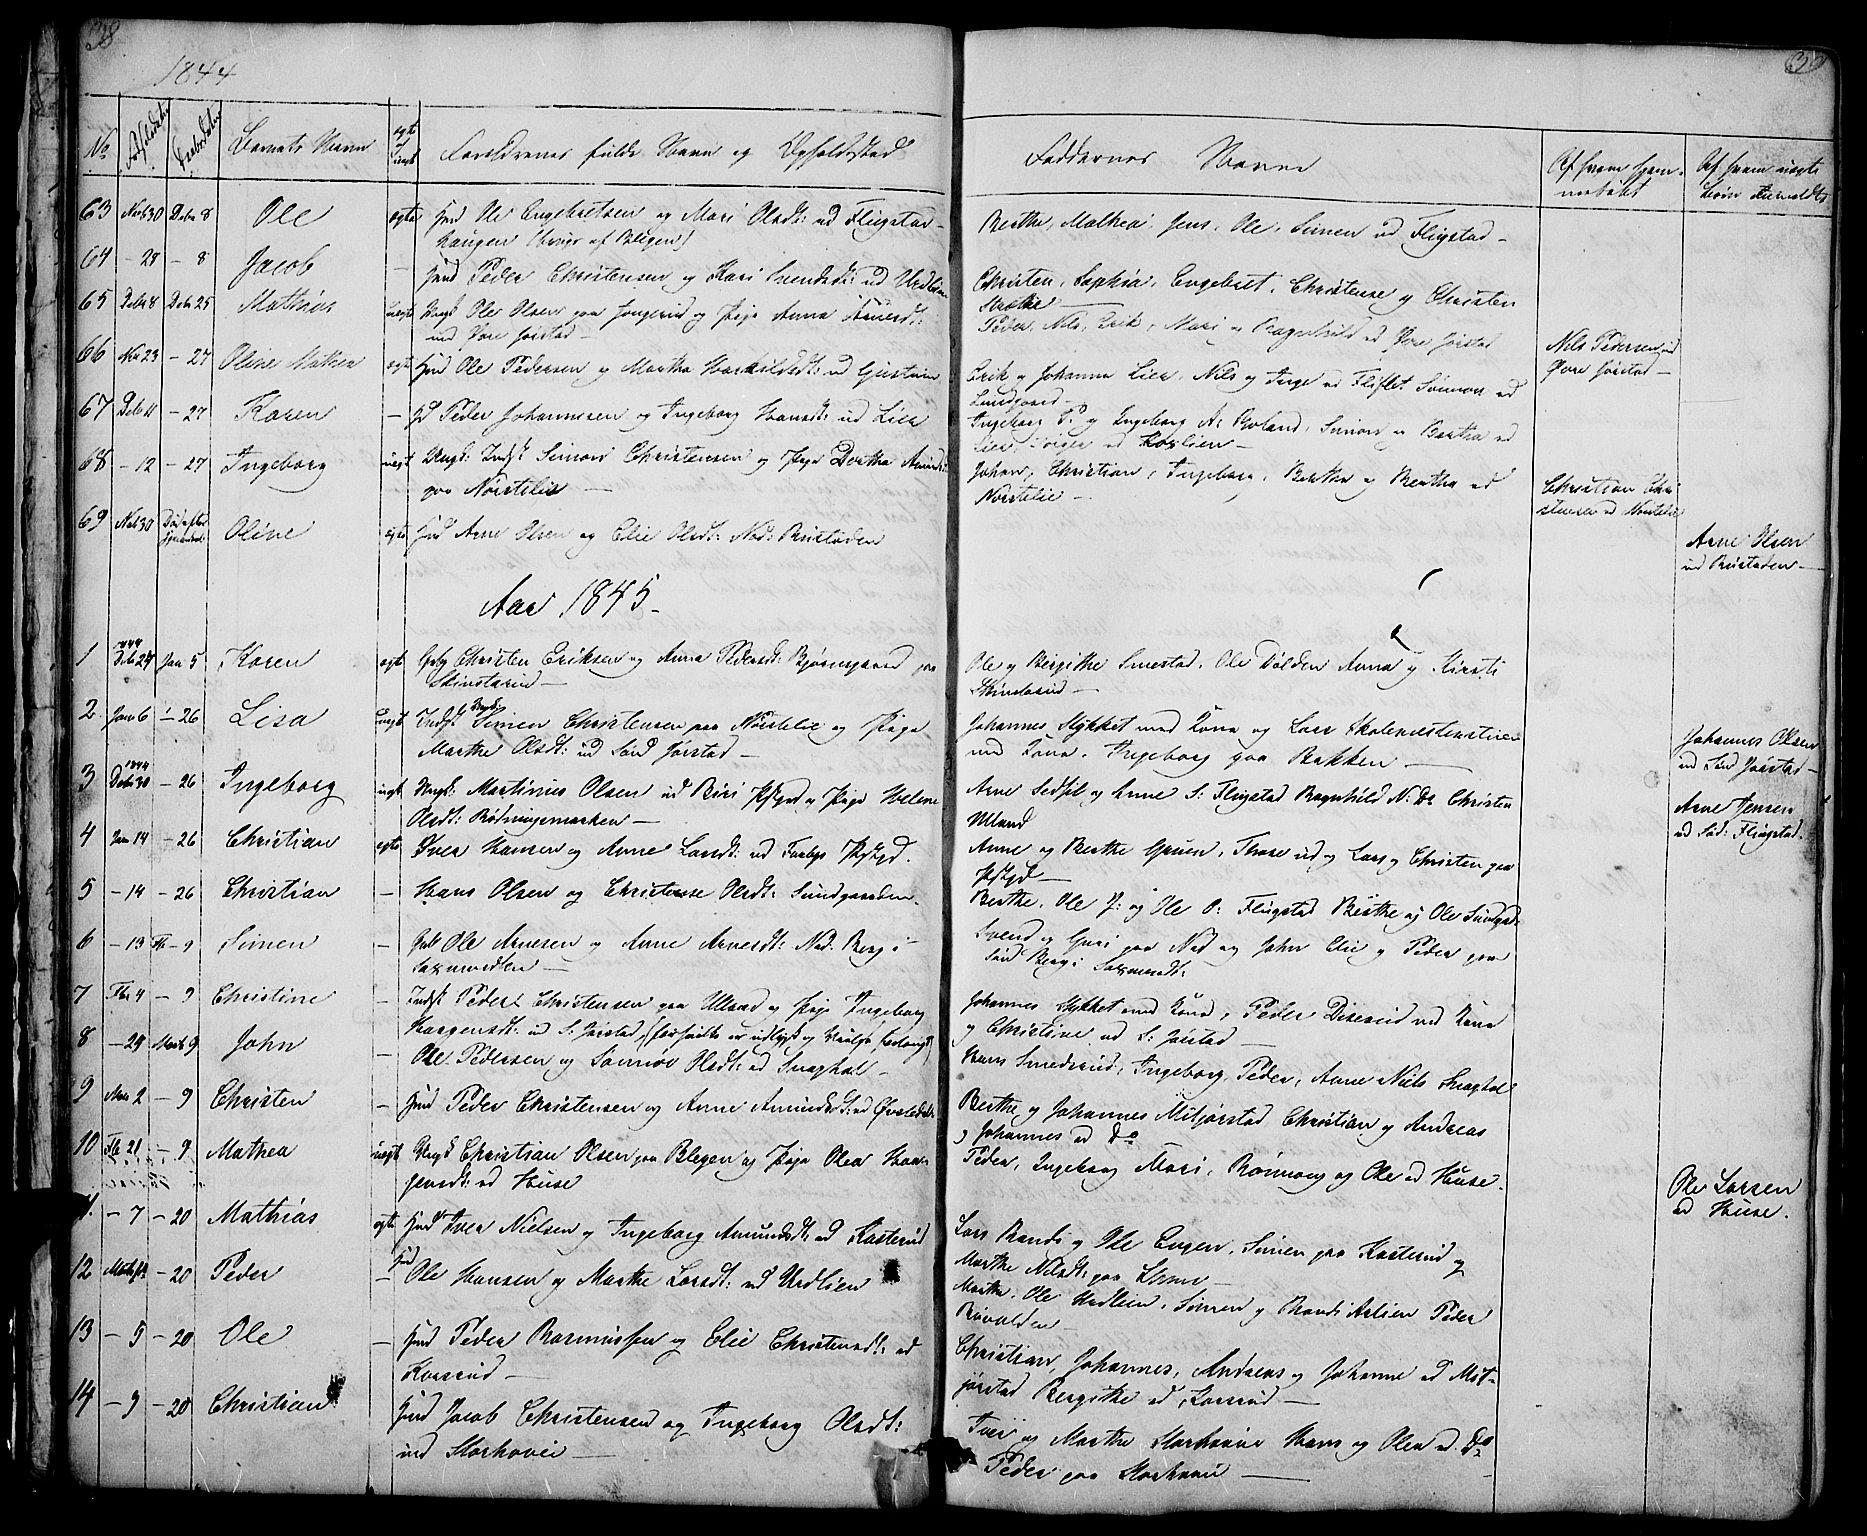 SAH, Fåberg prestekontor, Klokkerbok nr. 5, 1837-1864, s. 38-39